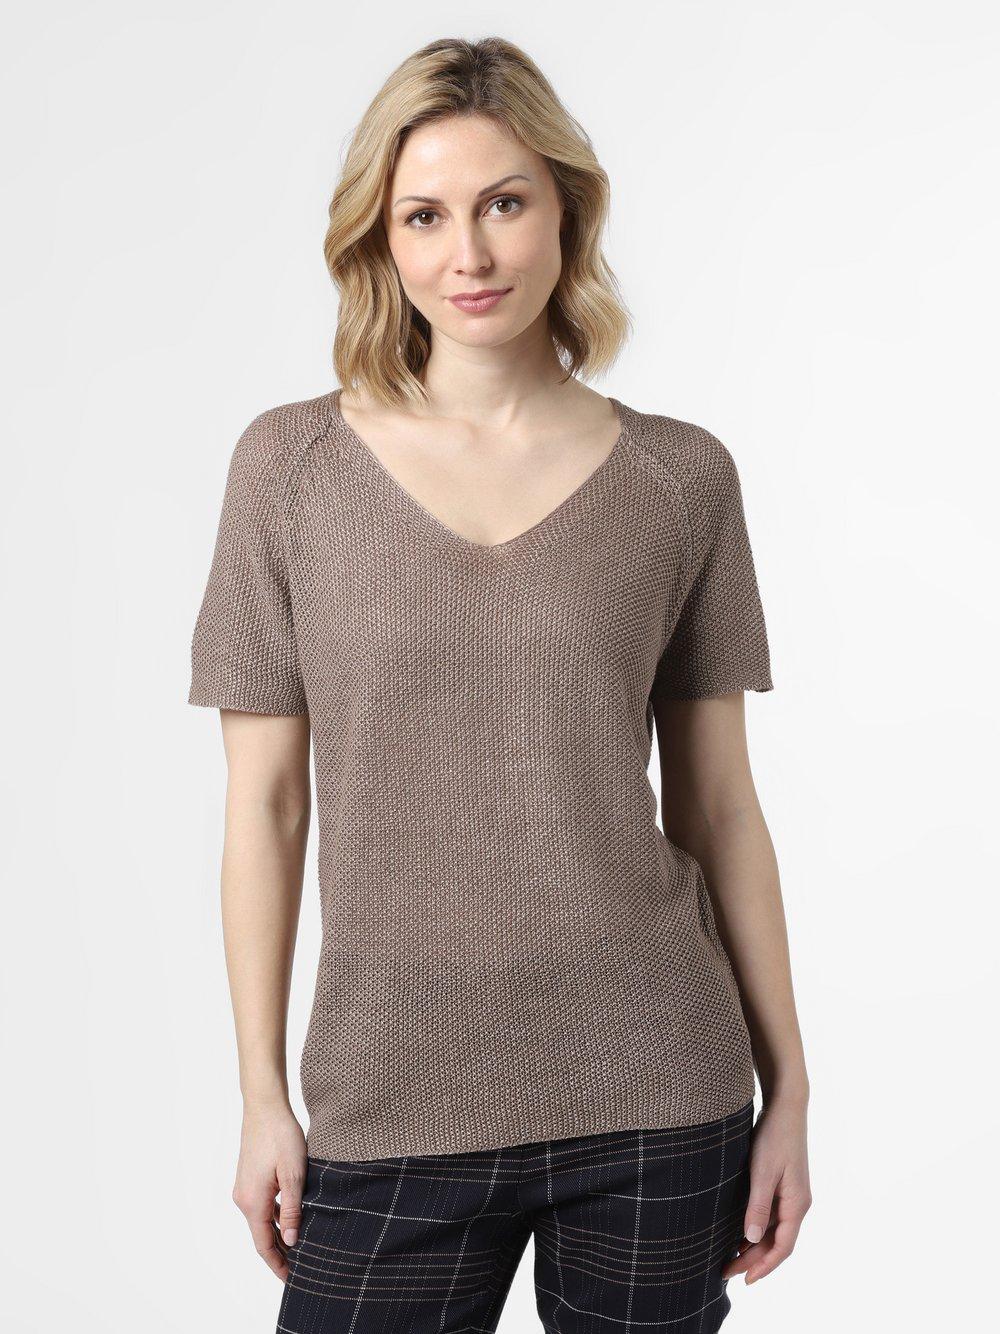 SvB Exquisit – Sweter damski z lnu, brązowy Van Graaf 461489-0002